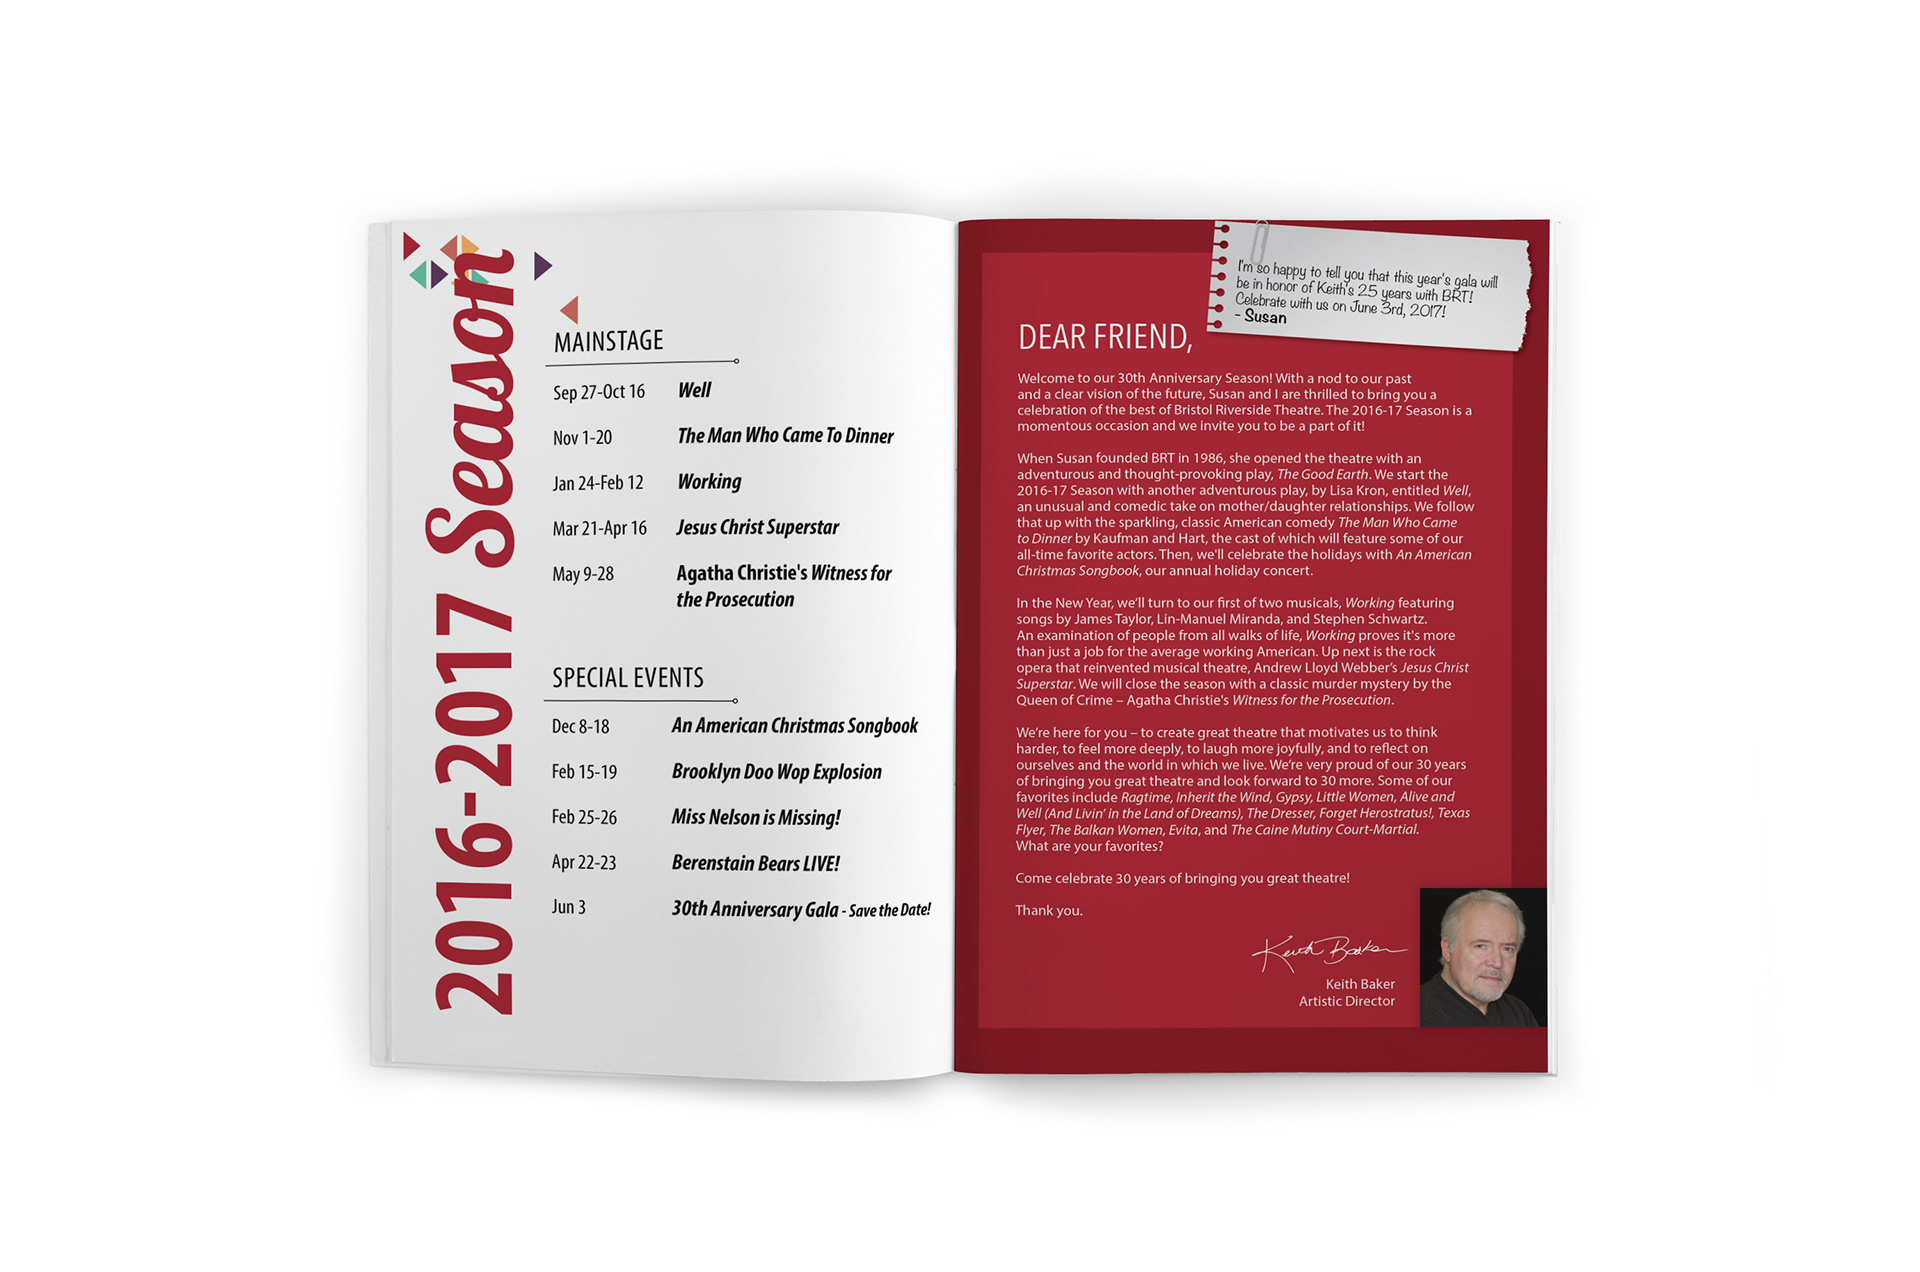 Brandy Stewart\'s Portfolio - 2016-2017 season brochure and show artwork